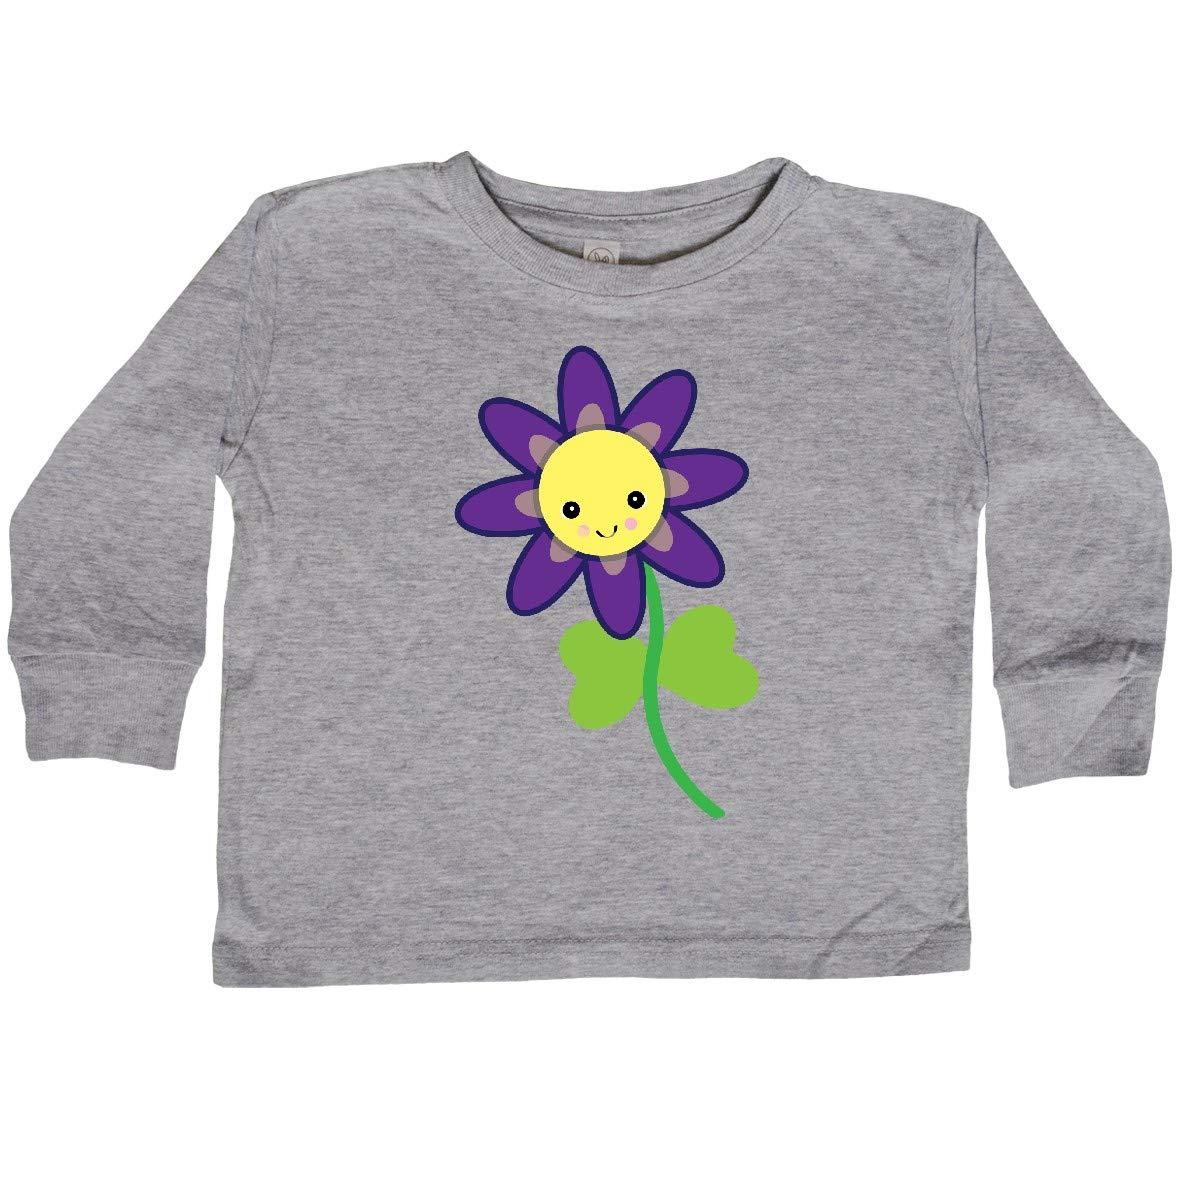 inktastic Cute Kawaii Purple and Yellow Flower Toddler Long Sleeve T-Shirt